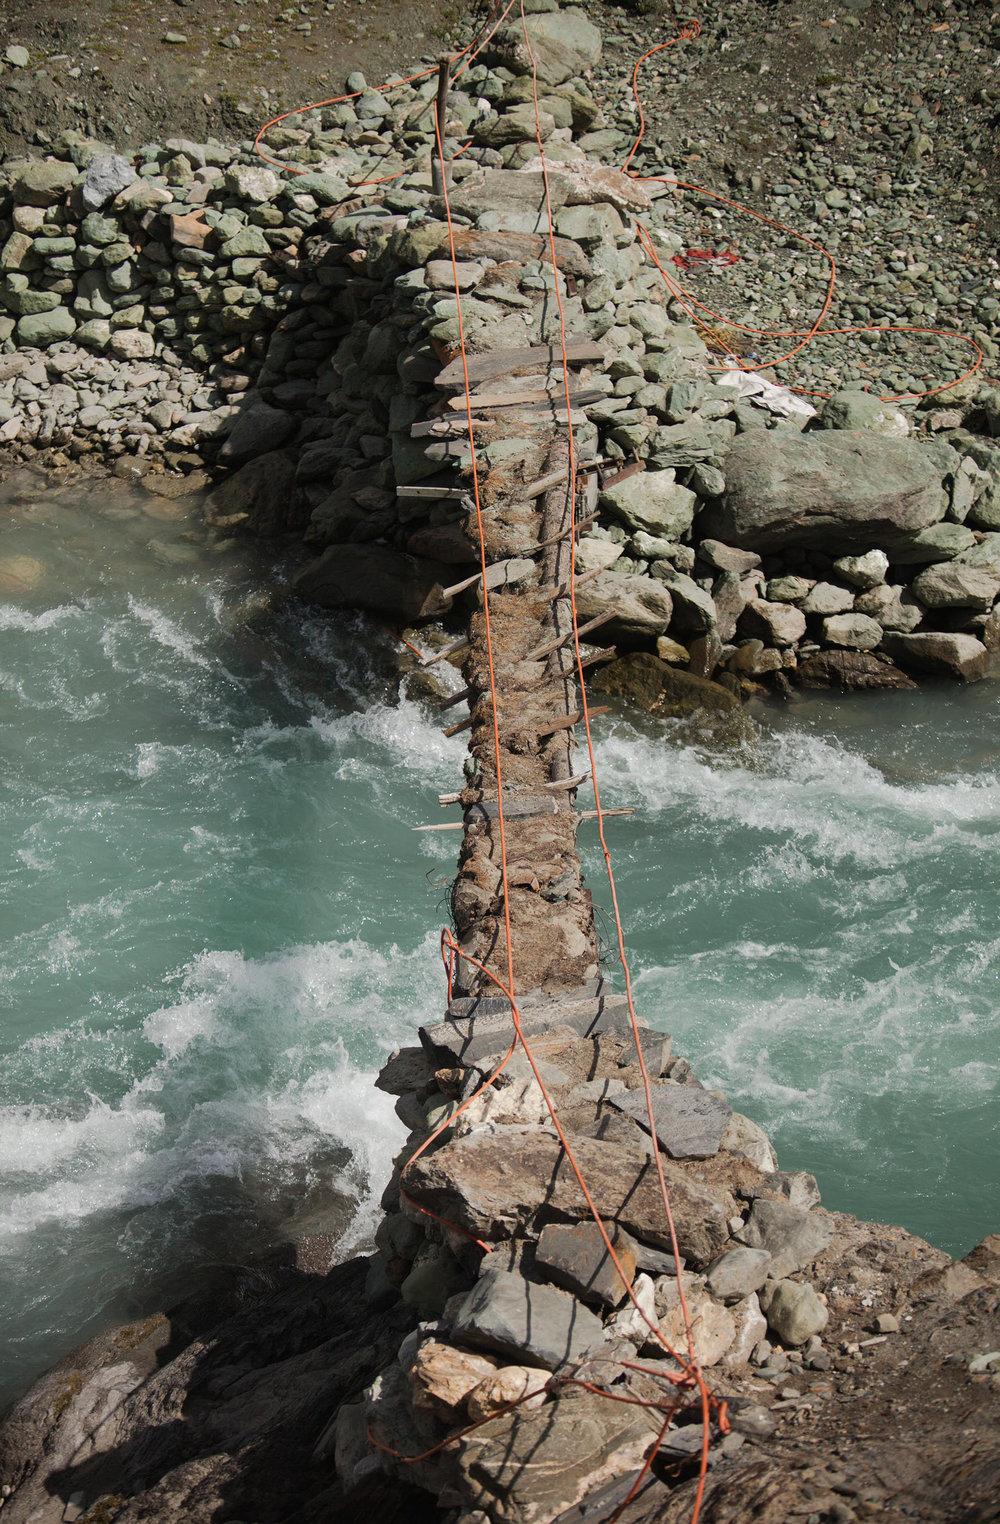 L - Ozzie-Hoppe-Photographer-India-Himalaya_a.jpg